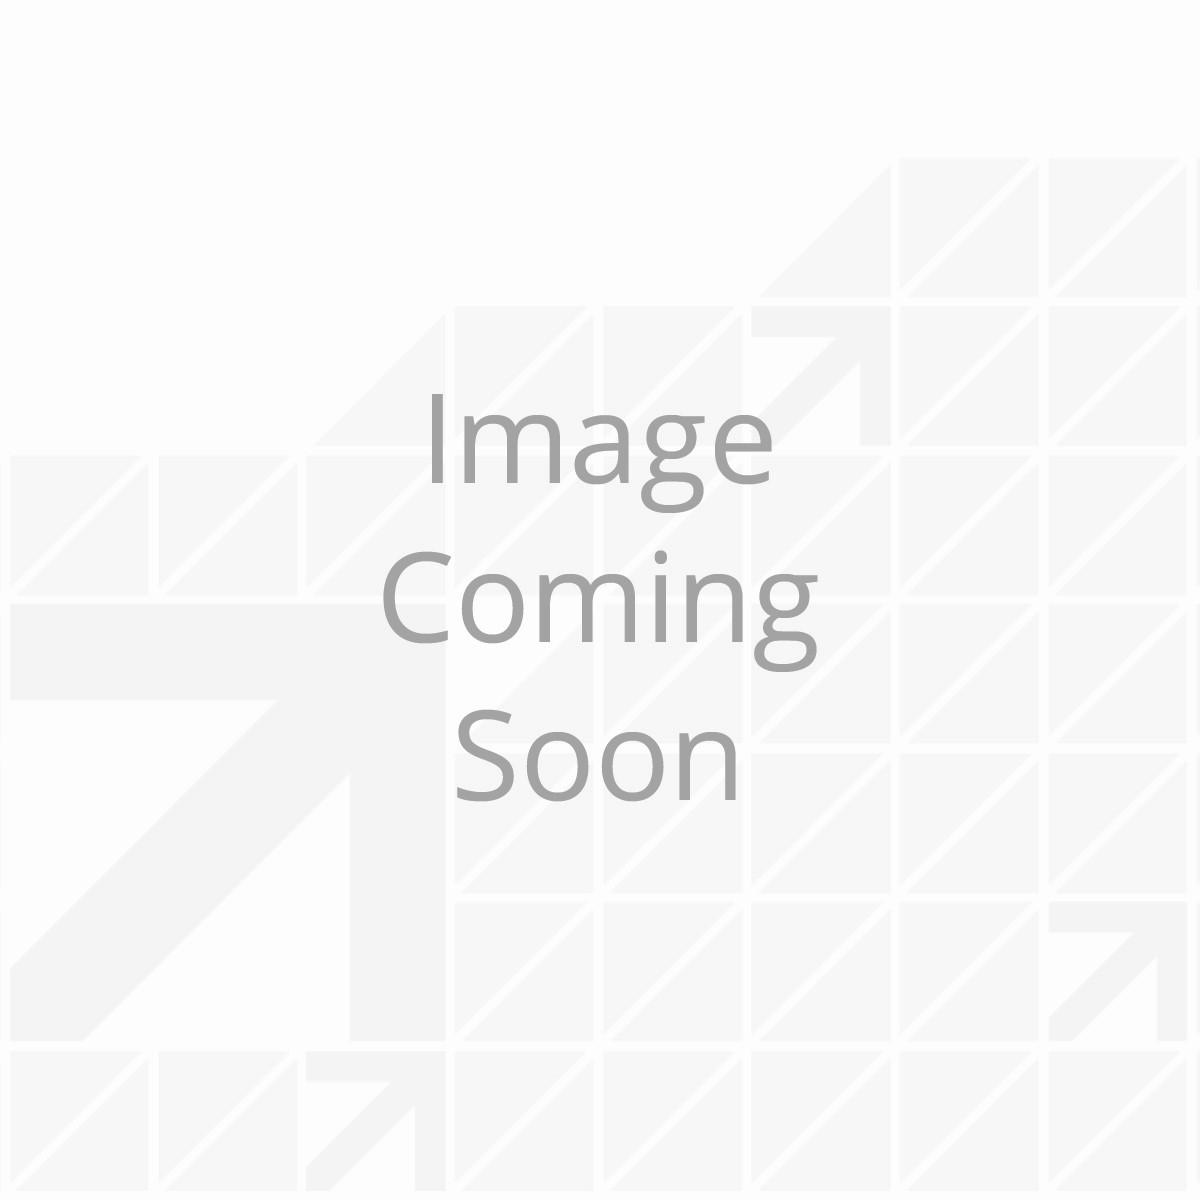 14' Power & Hybrid Awning Roller Assembly - Prepflex Silver Fade